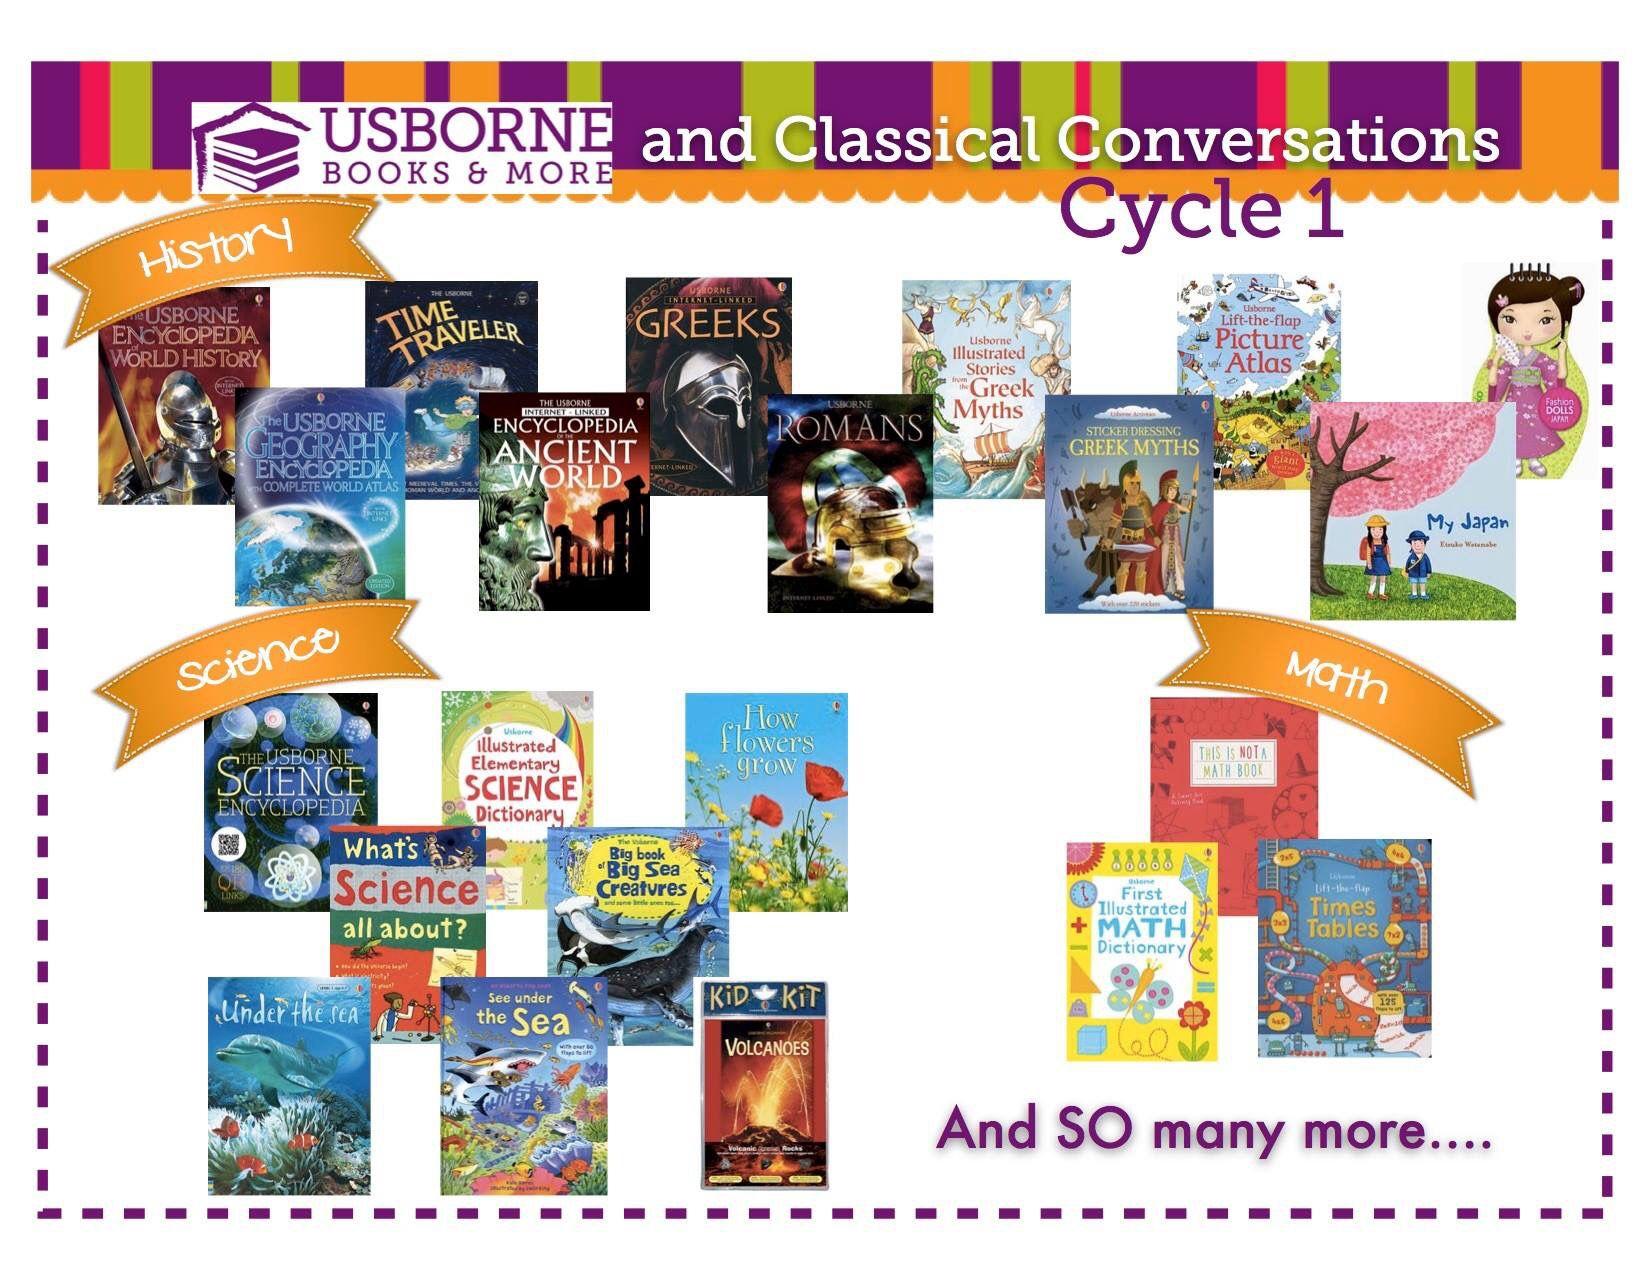 Classical Conversations Usborne books match ups. Usborne